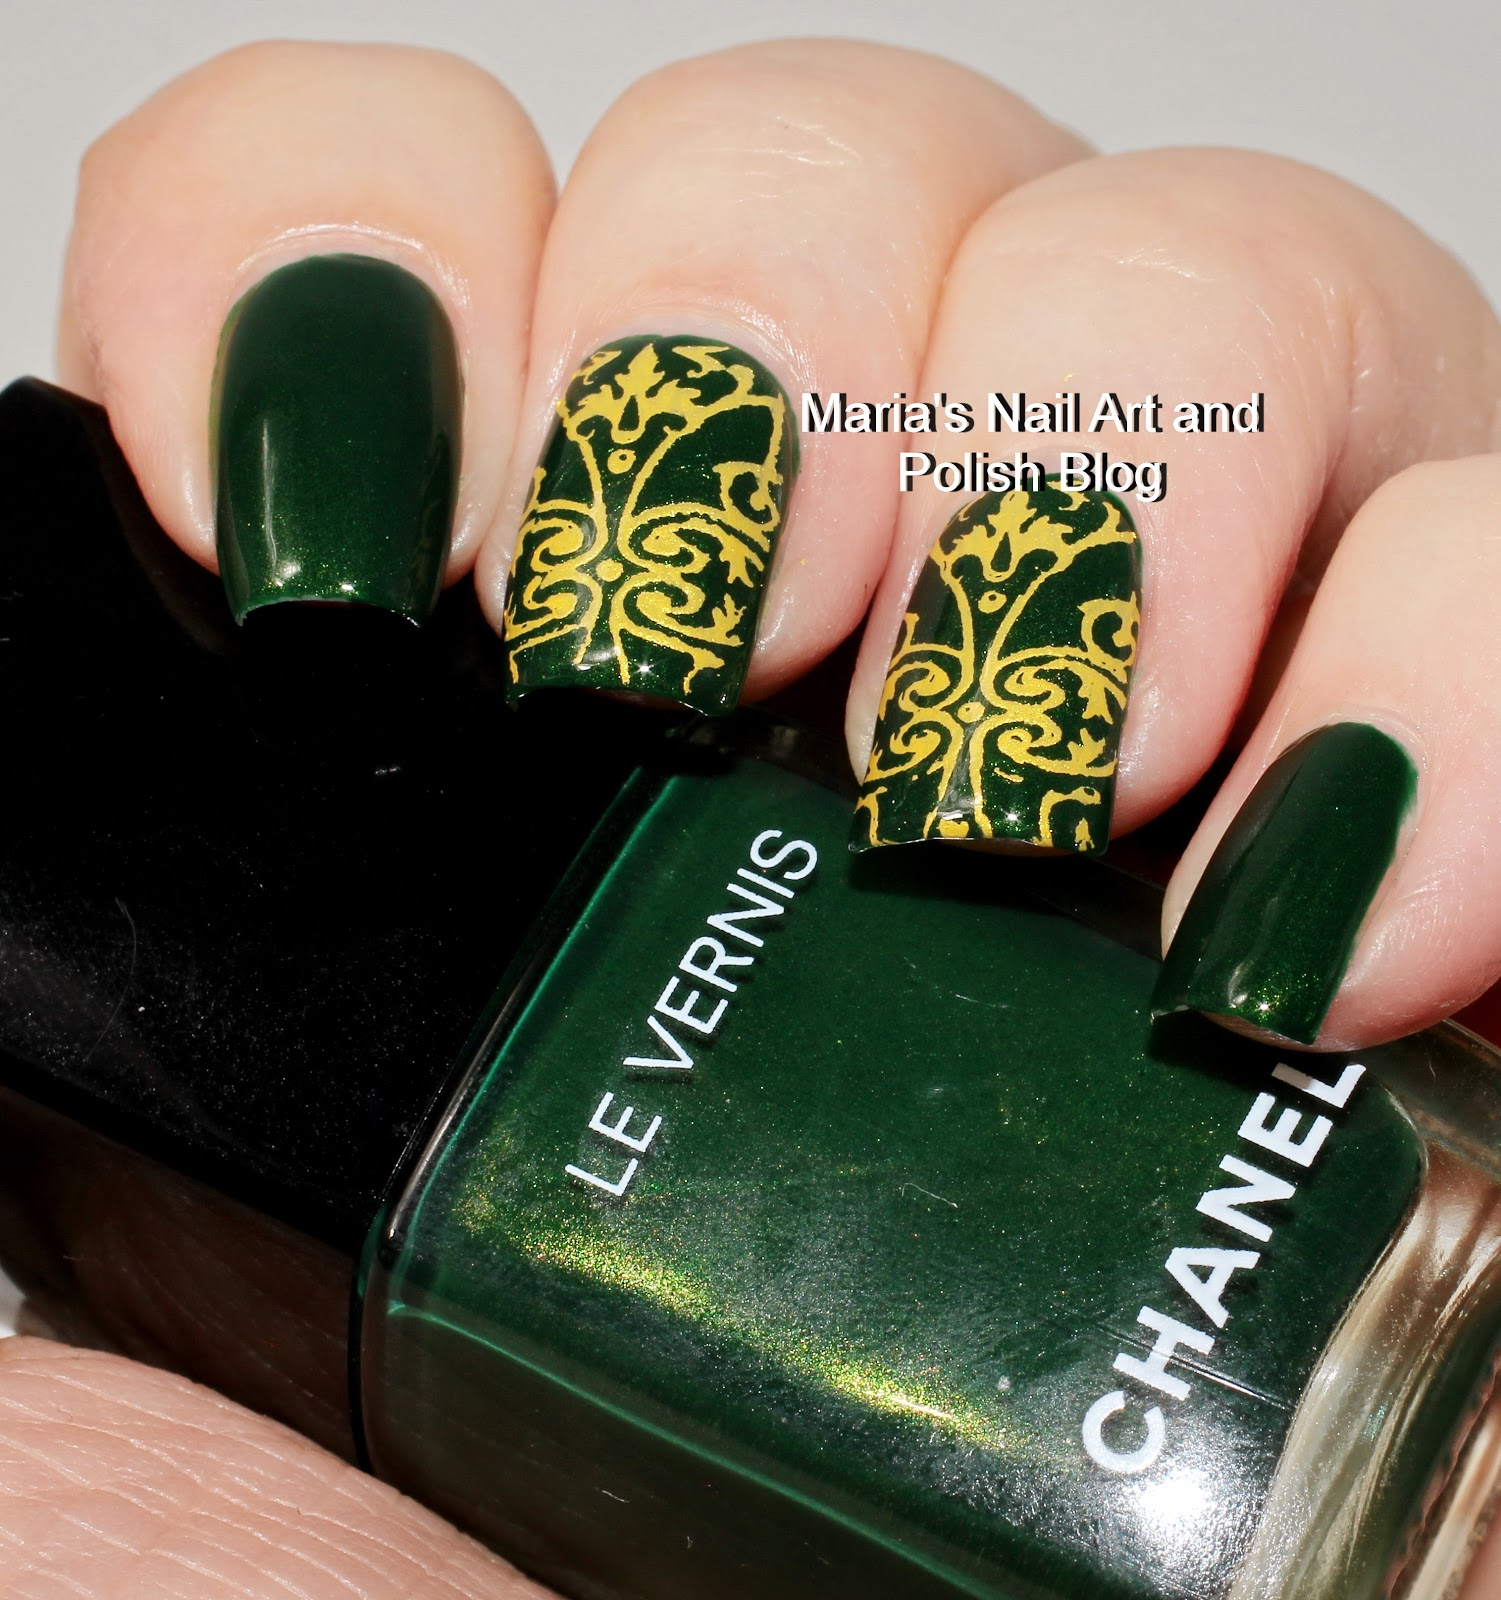 Marias Nail Art and Polish Blog: My stamping journey - part 18